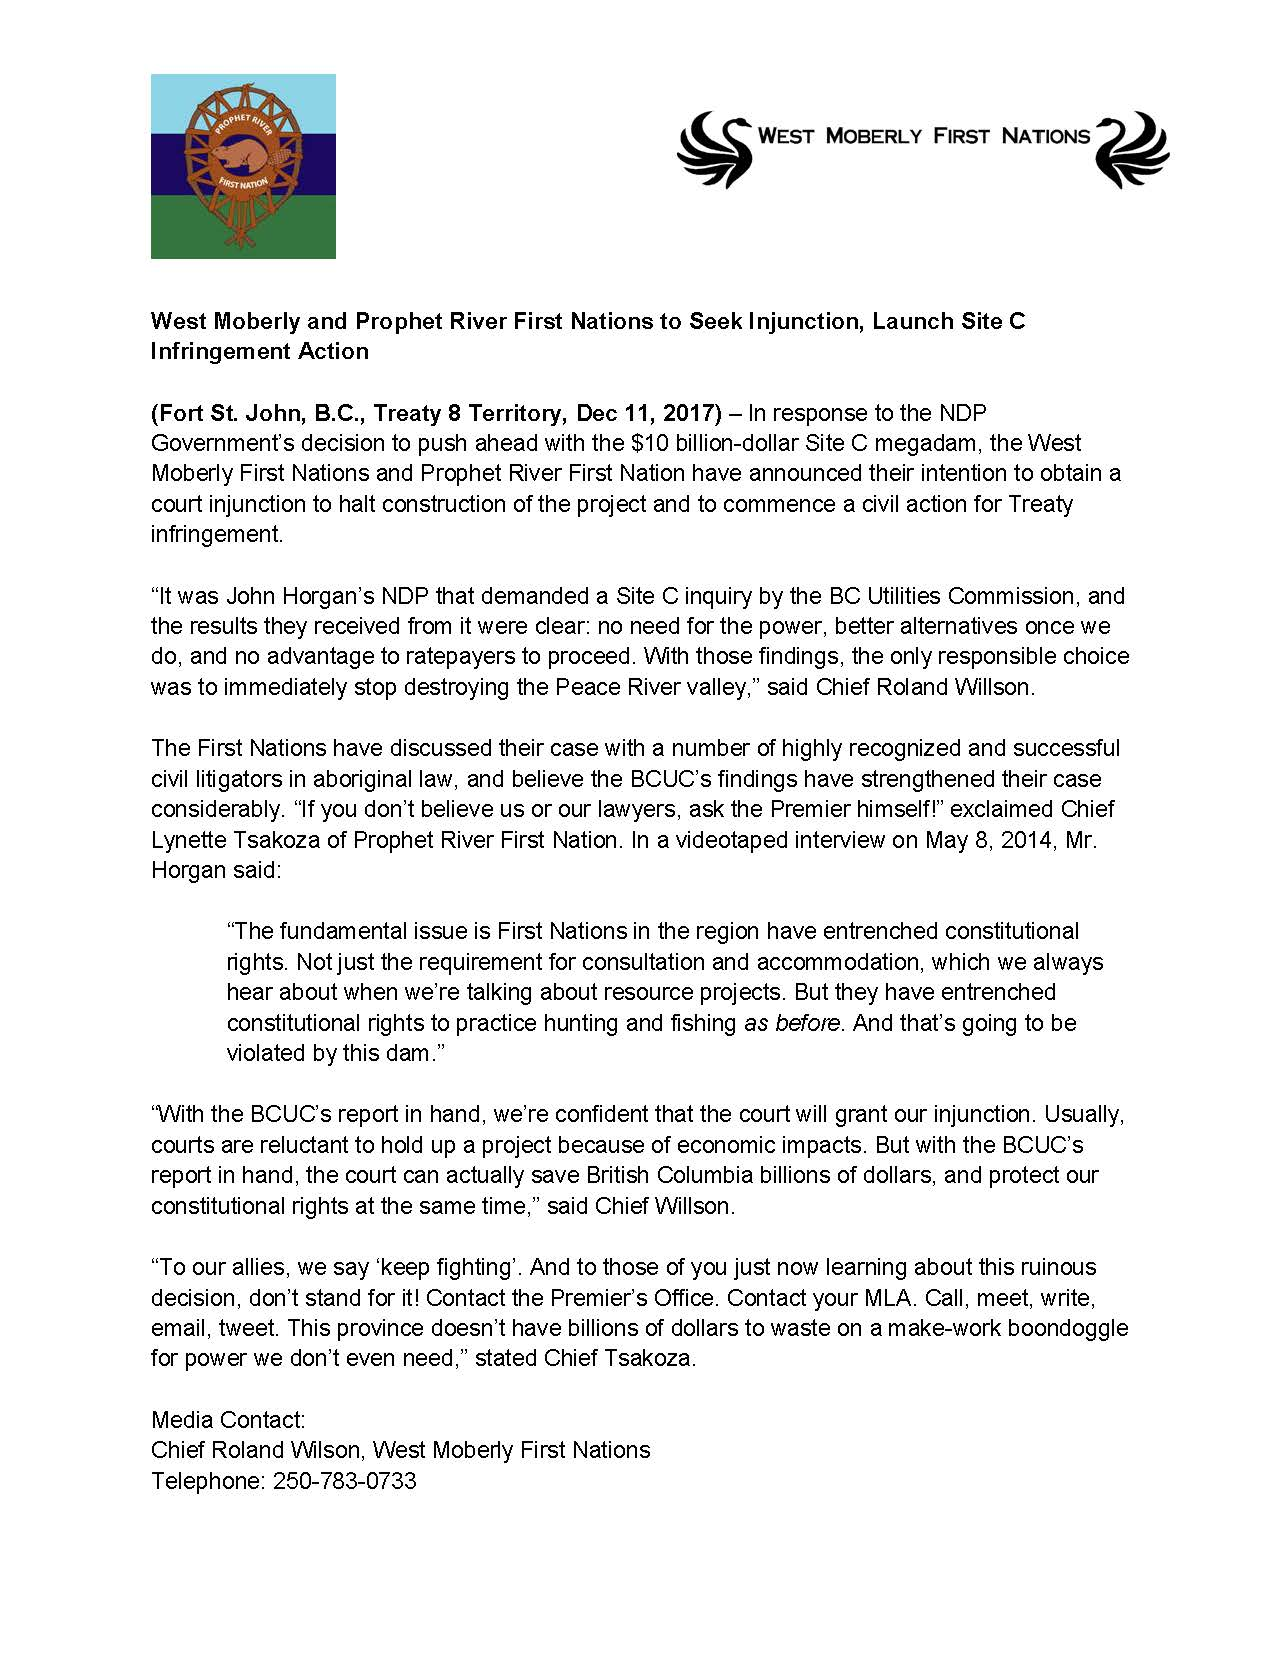 2017 12 11 PR (FNs to seek injunction, launch infringement claim)_final.jpg